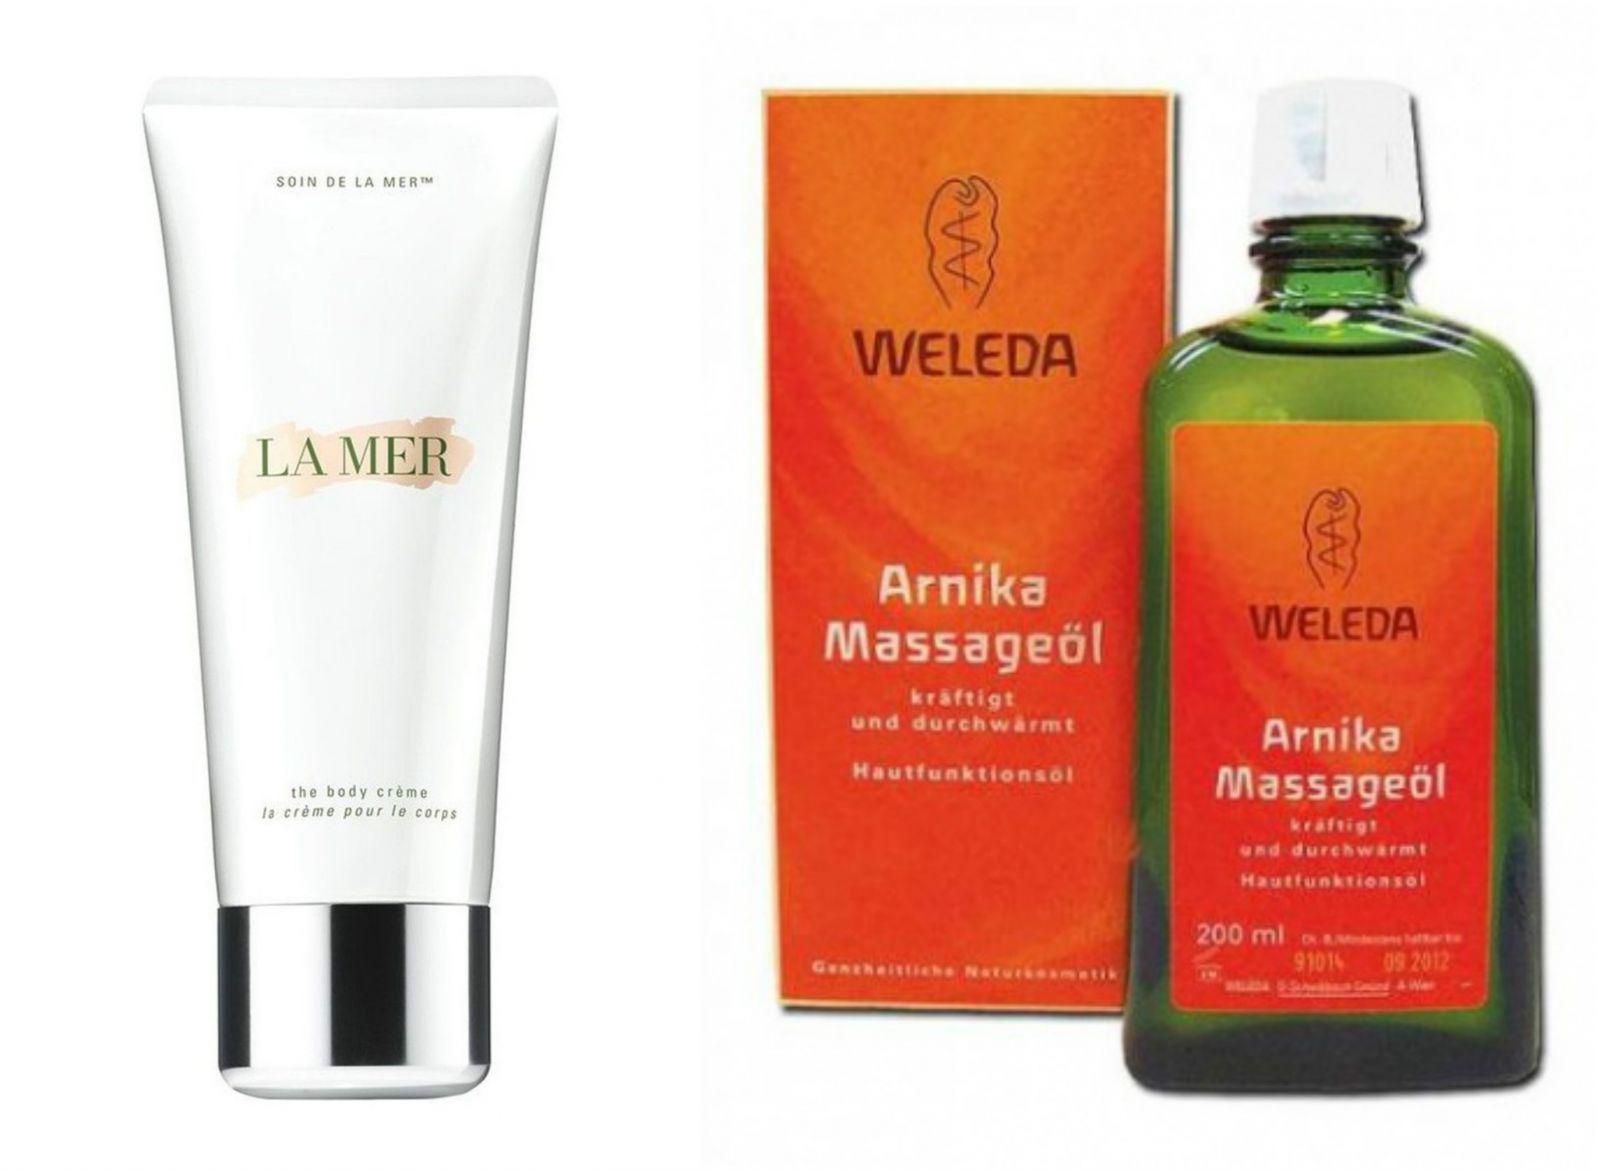 La Mer The Body Creme и Массажное масло Арника Weleda Arnika Massageol